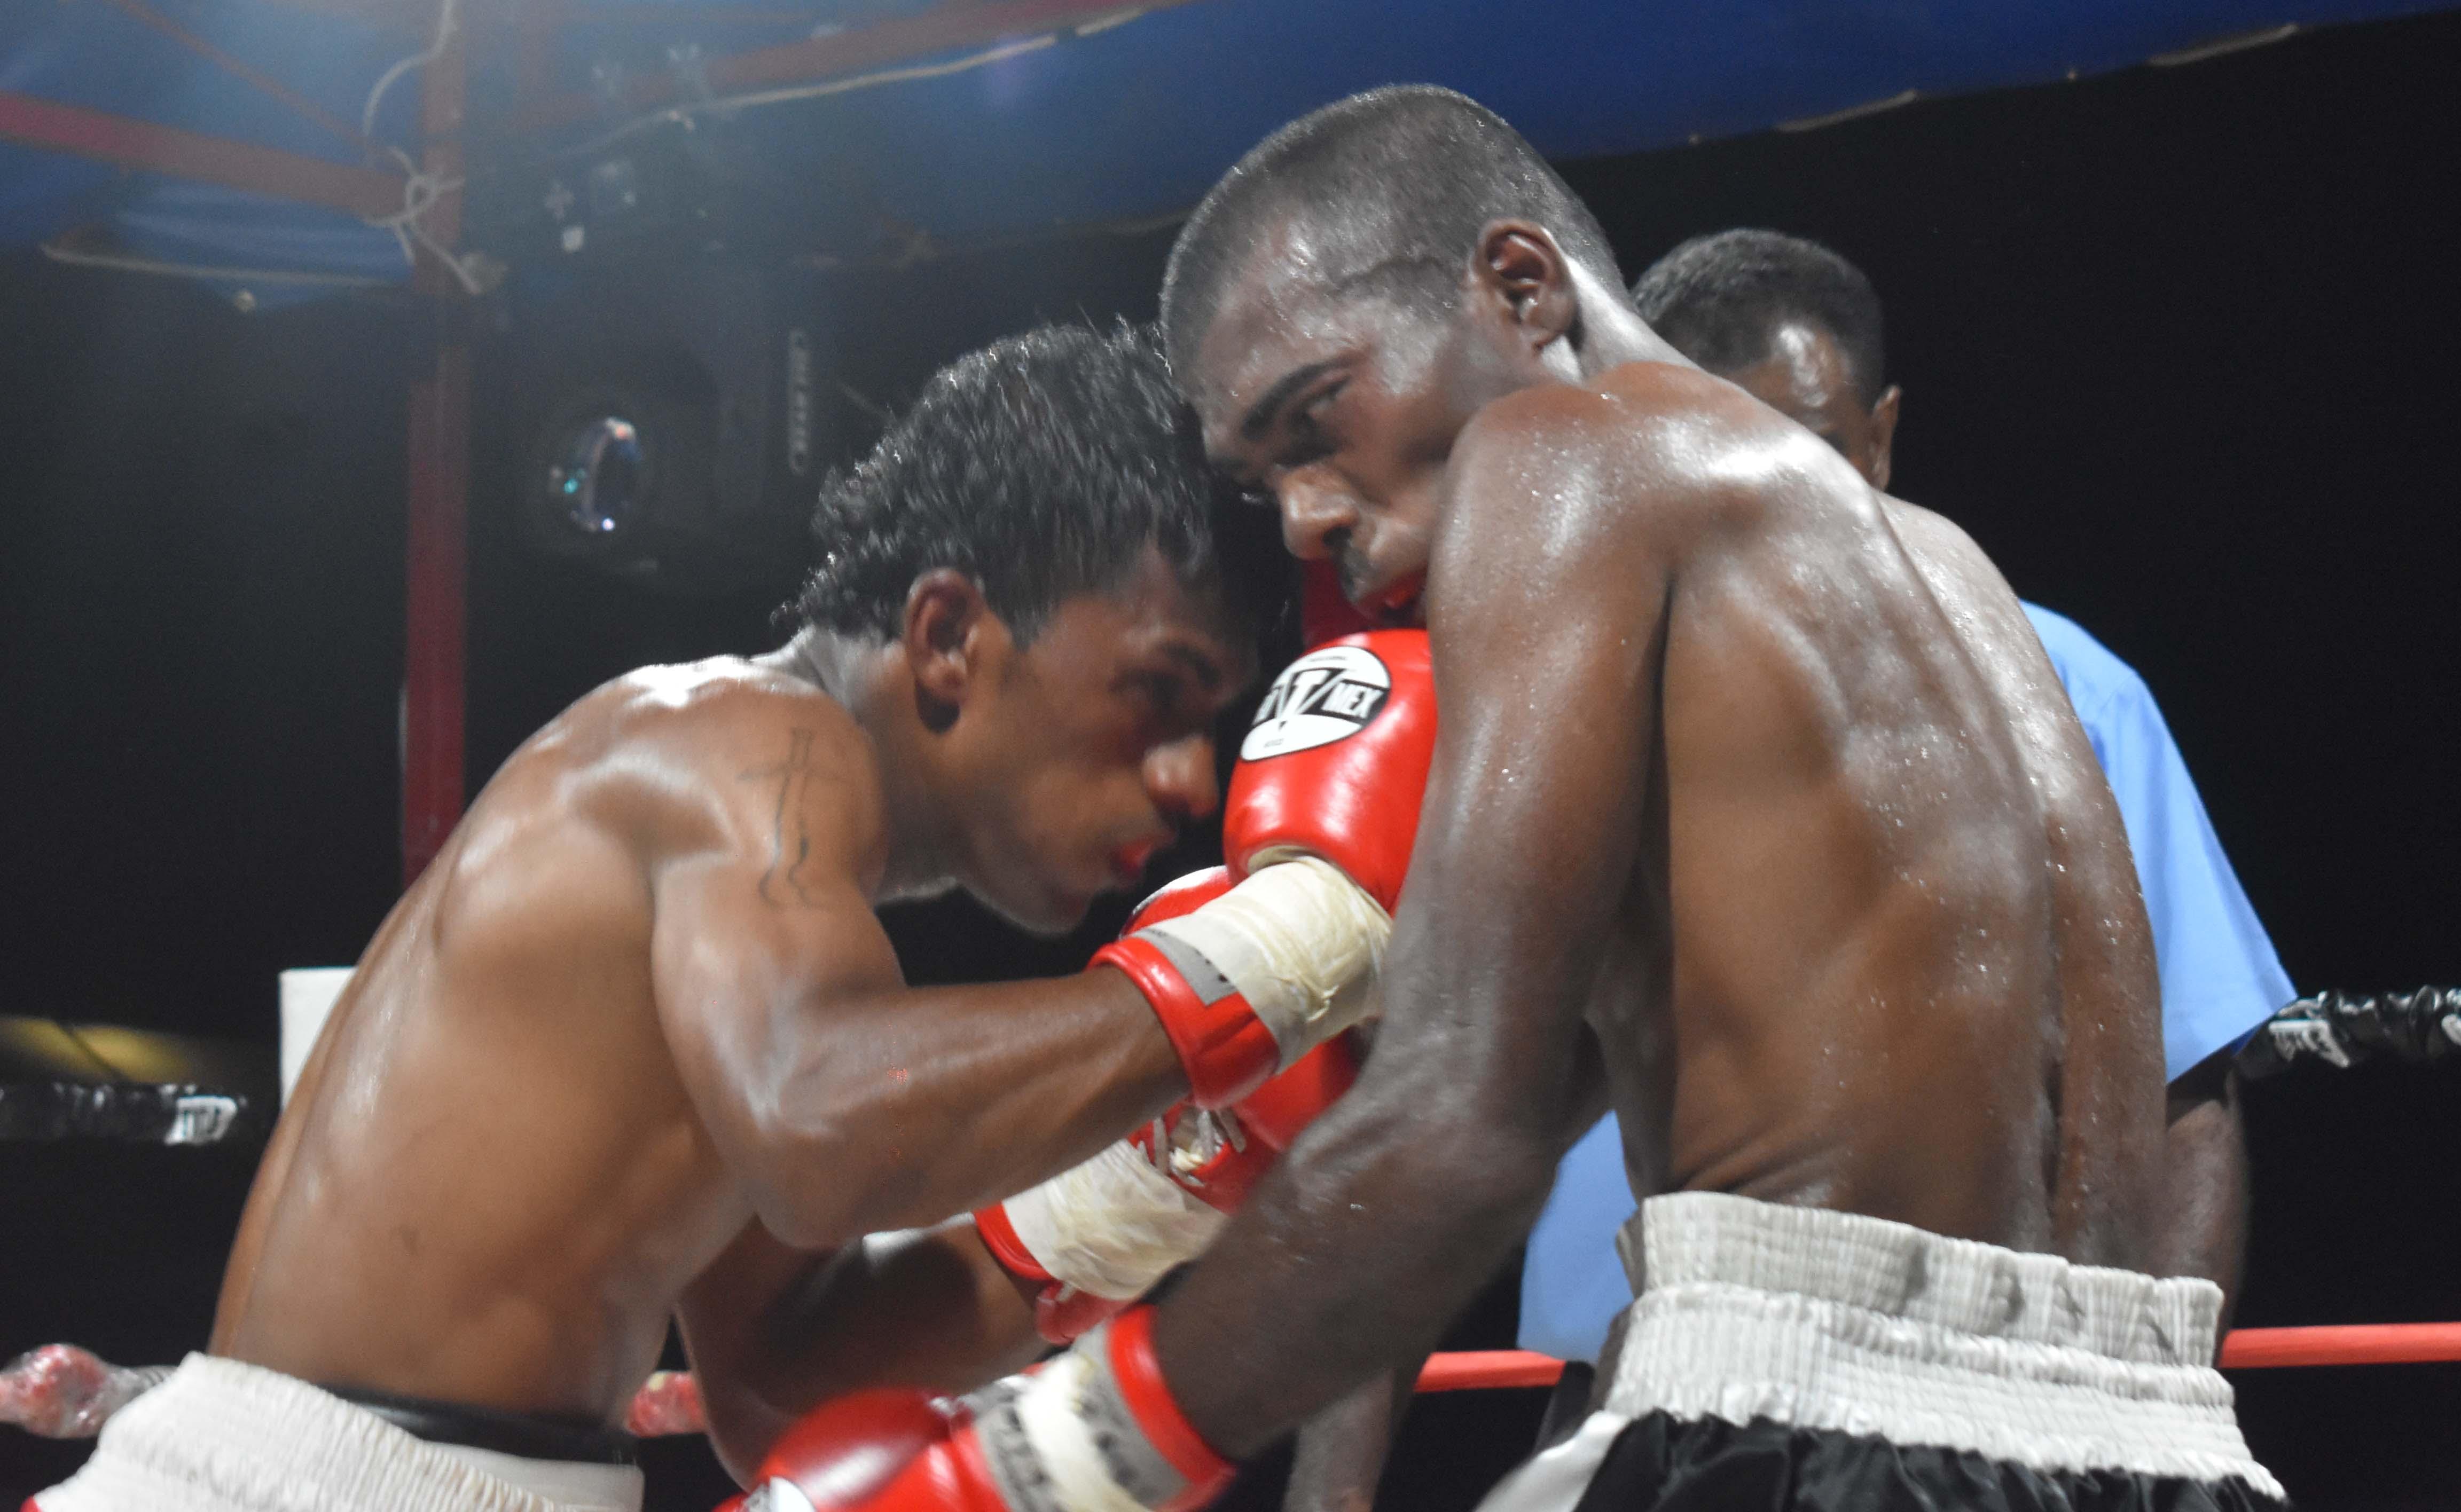 Shamal Ramanuj beats Ritesh Gounder at the Prince Charles Park in Nadi last night. Photo: WAISEA NASOKIA